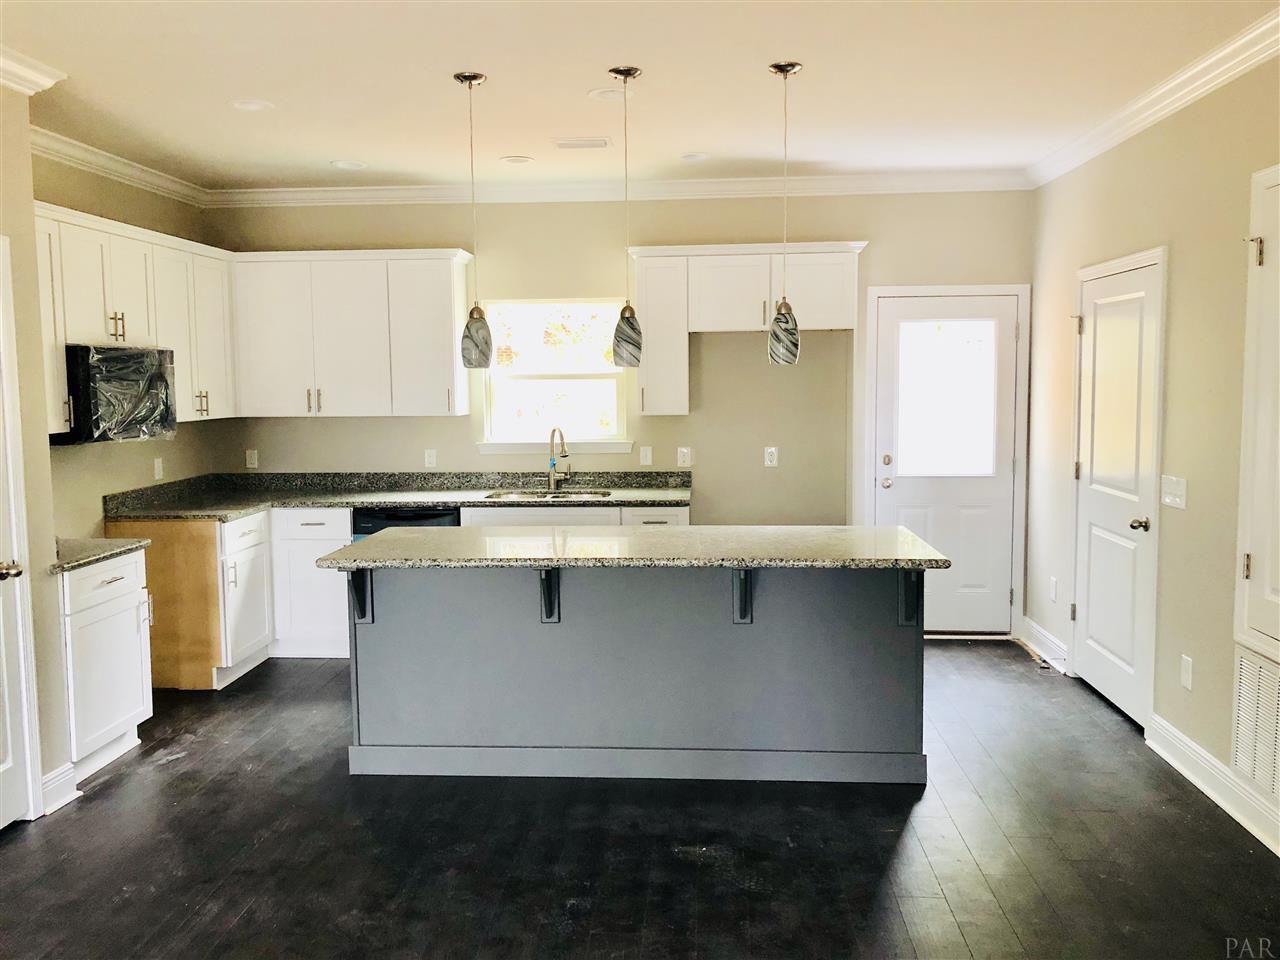 2480 Toni St, Pensacola, FL 32504 - Estimate and Home Details | Trulia